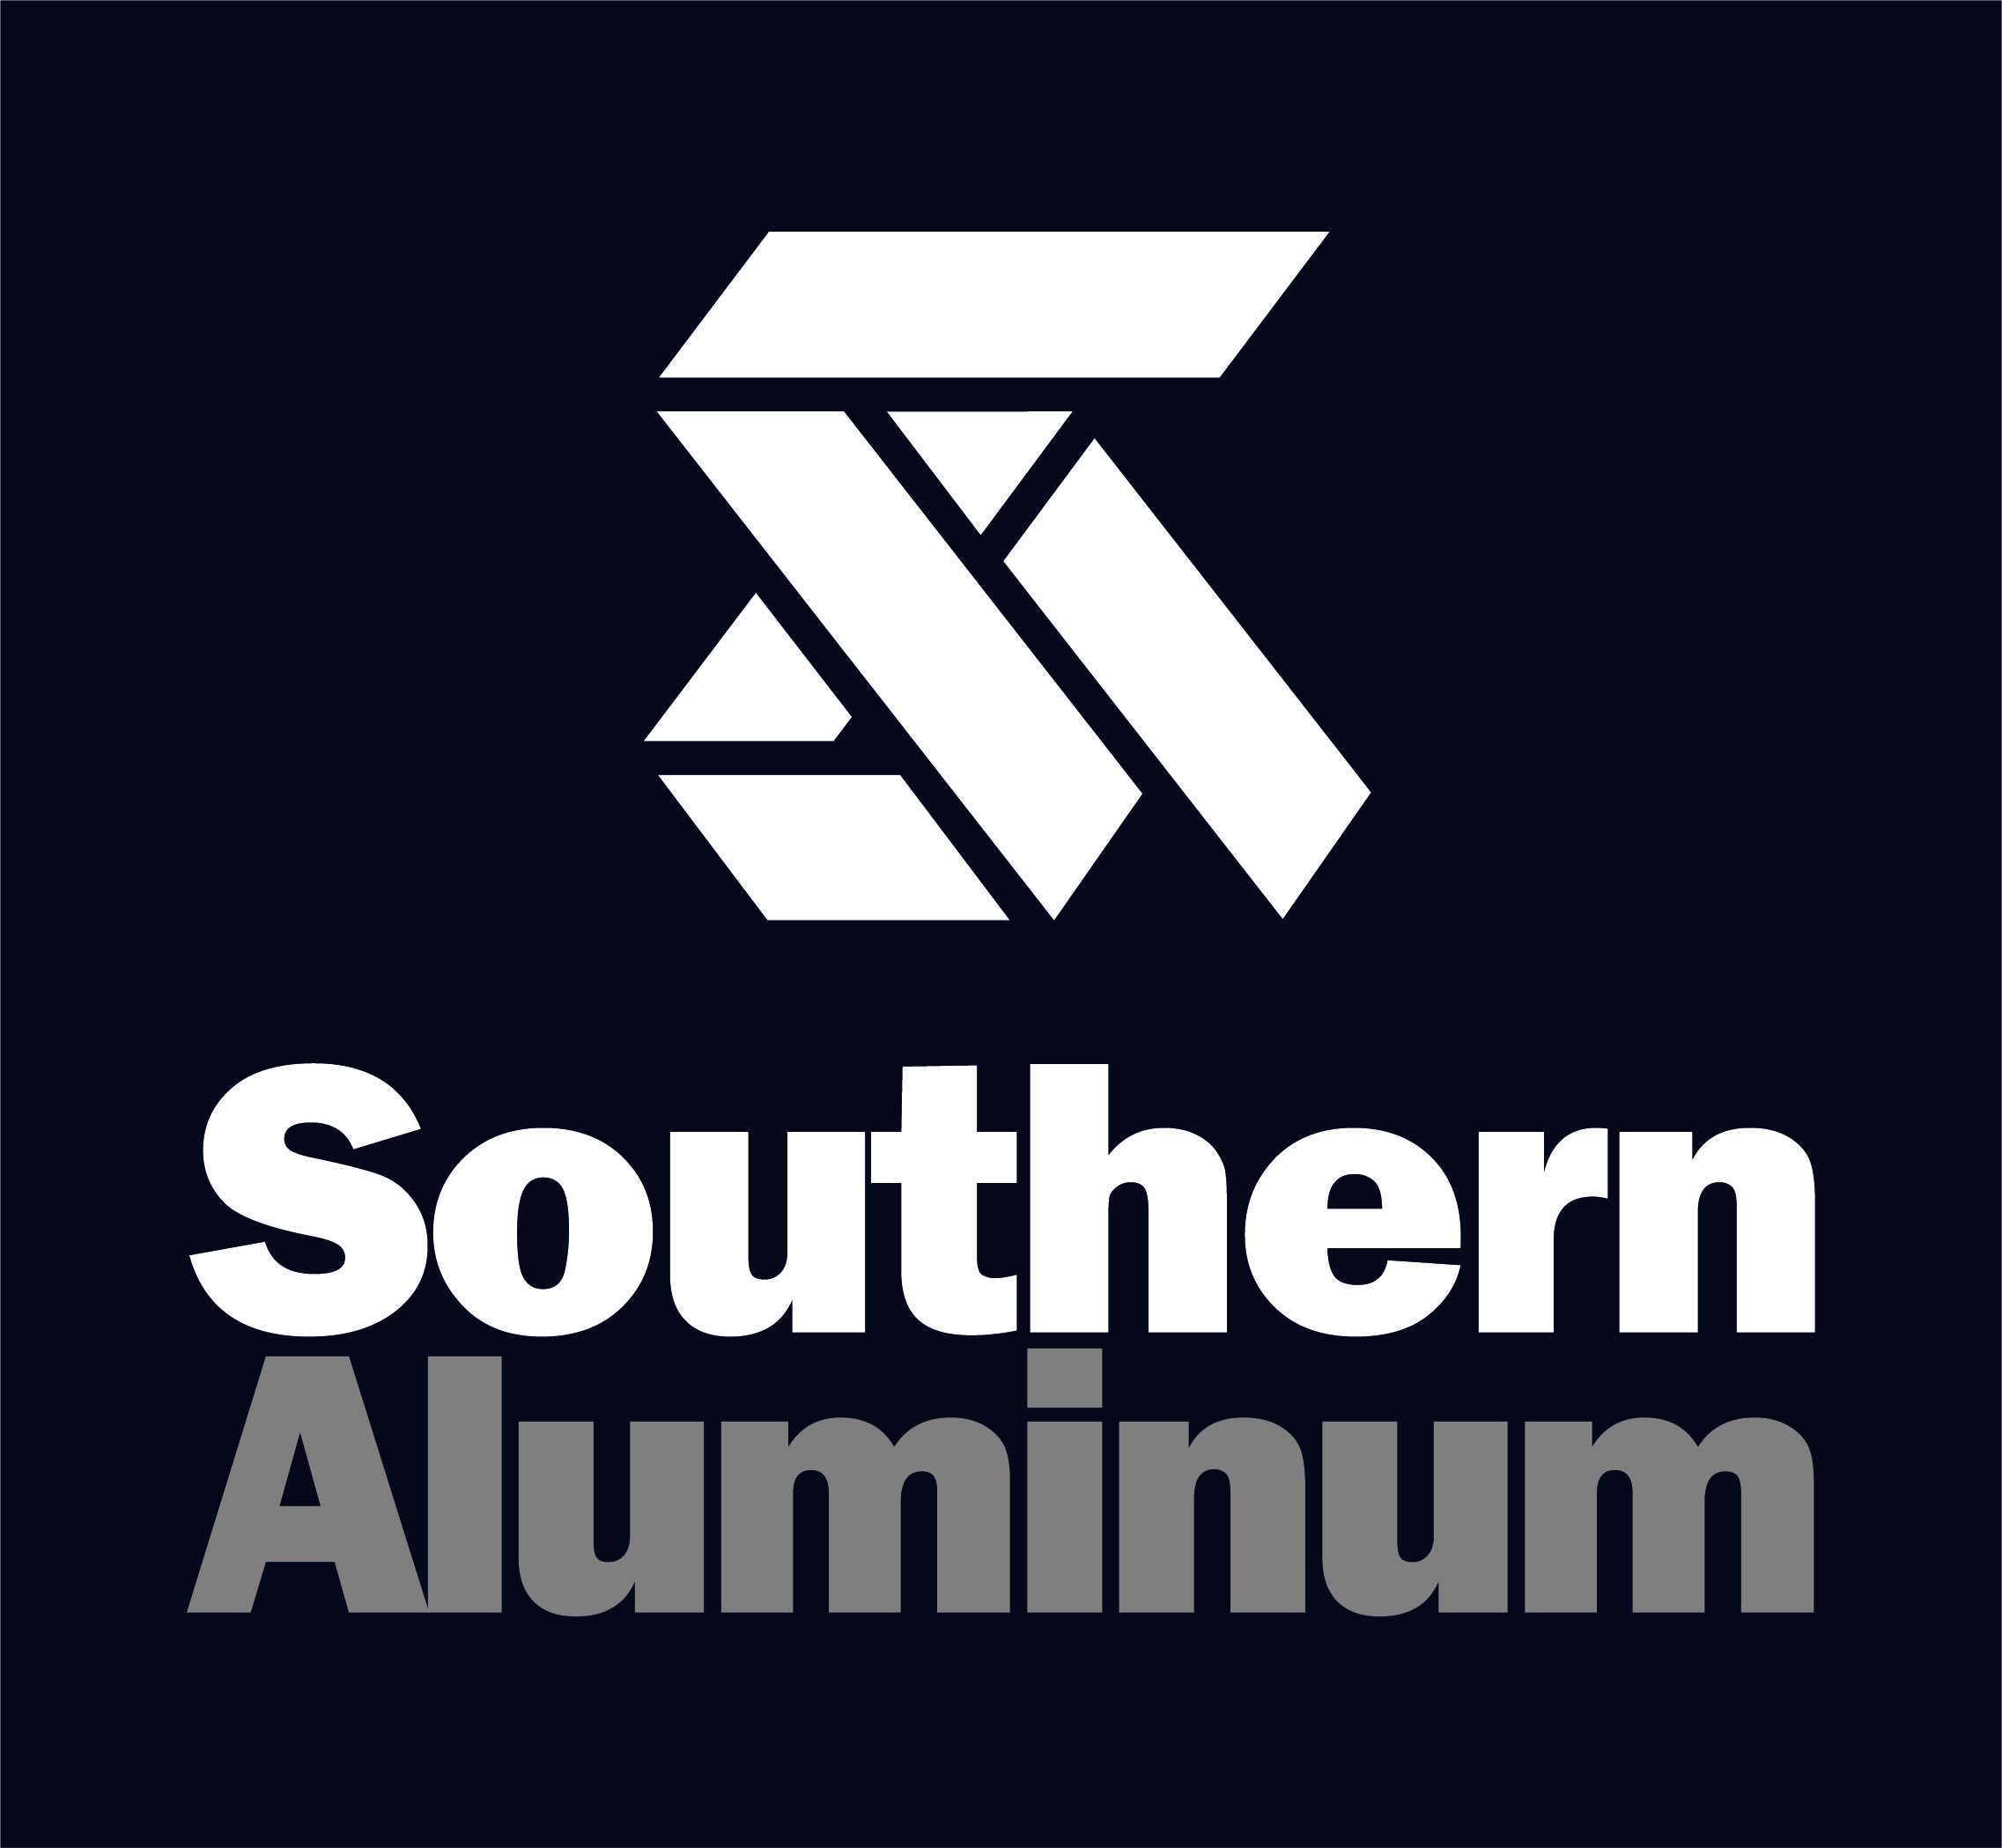 Southern Aluminum Logo